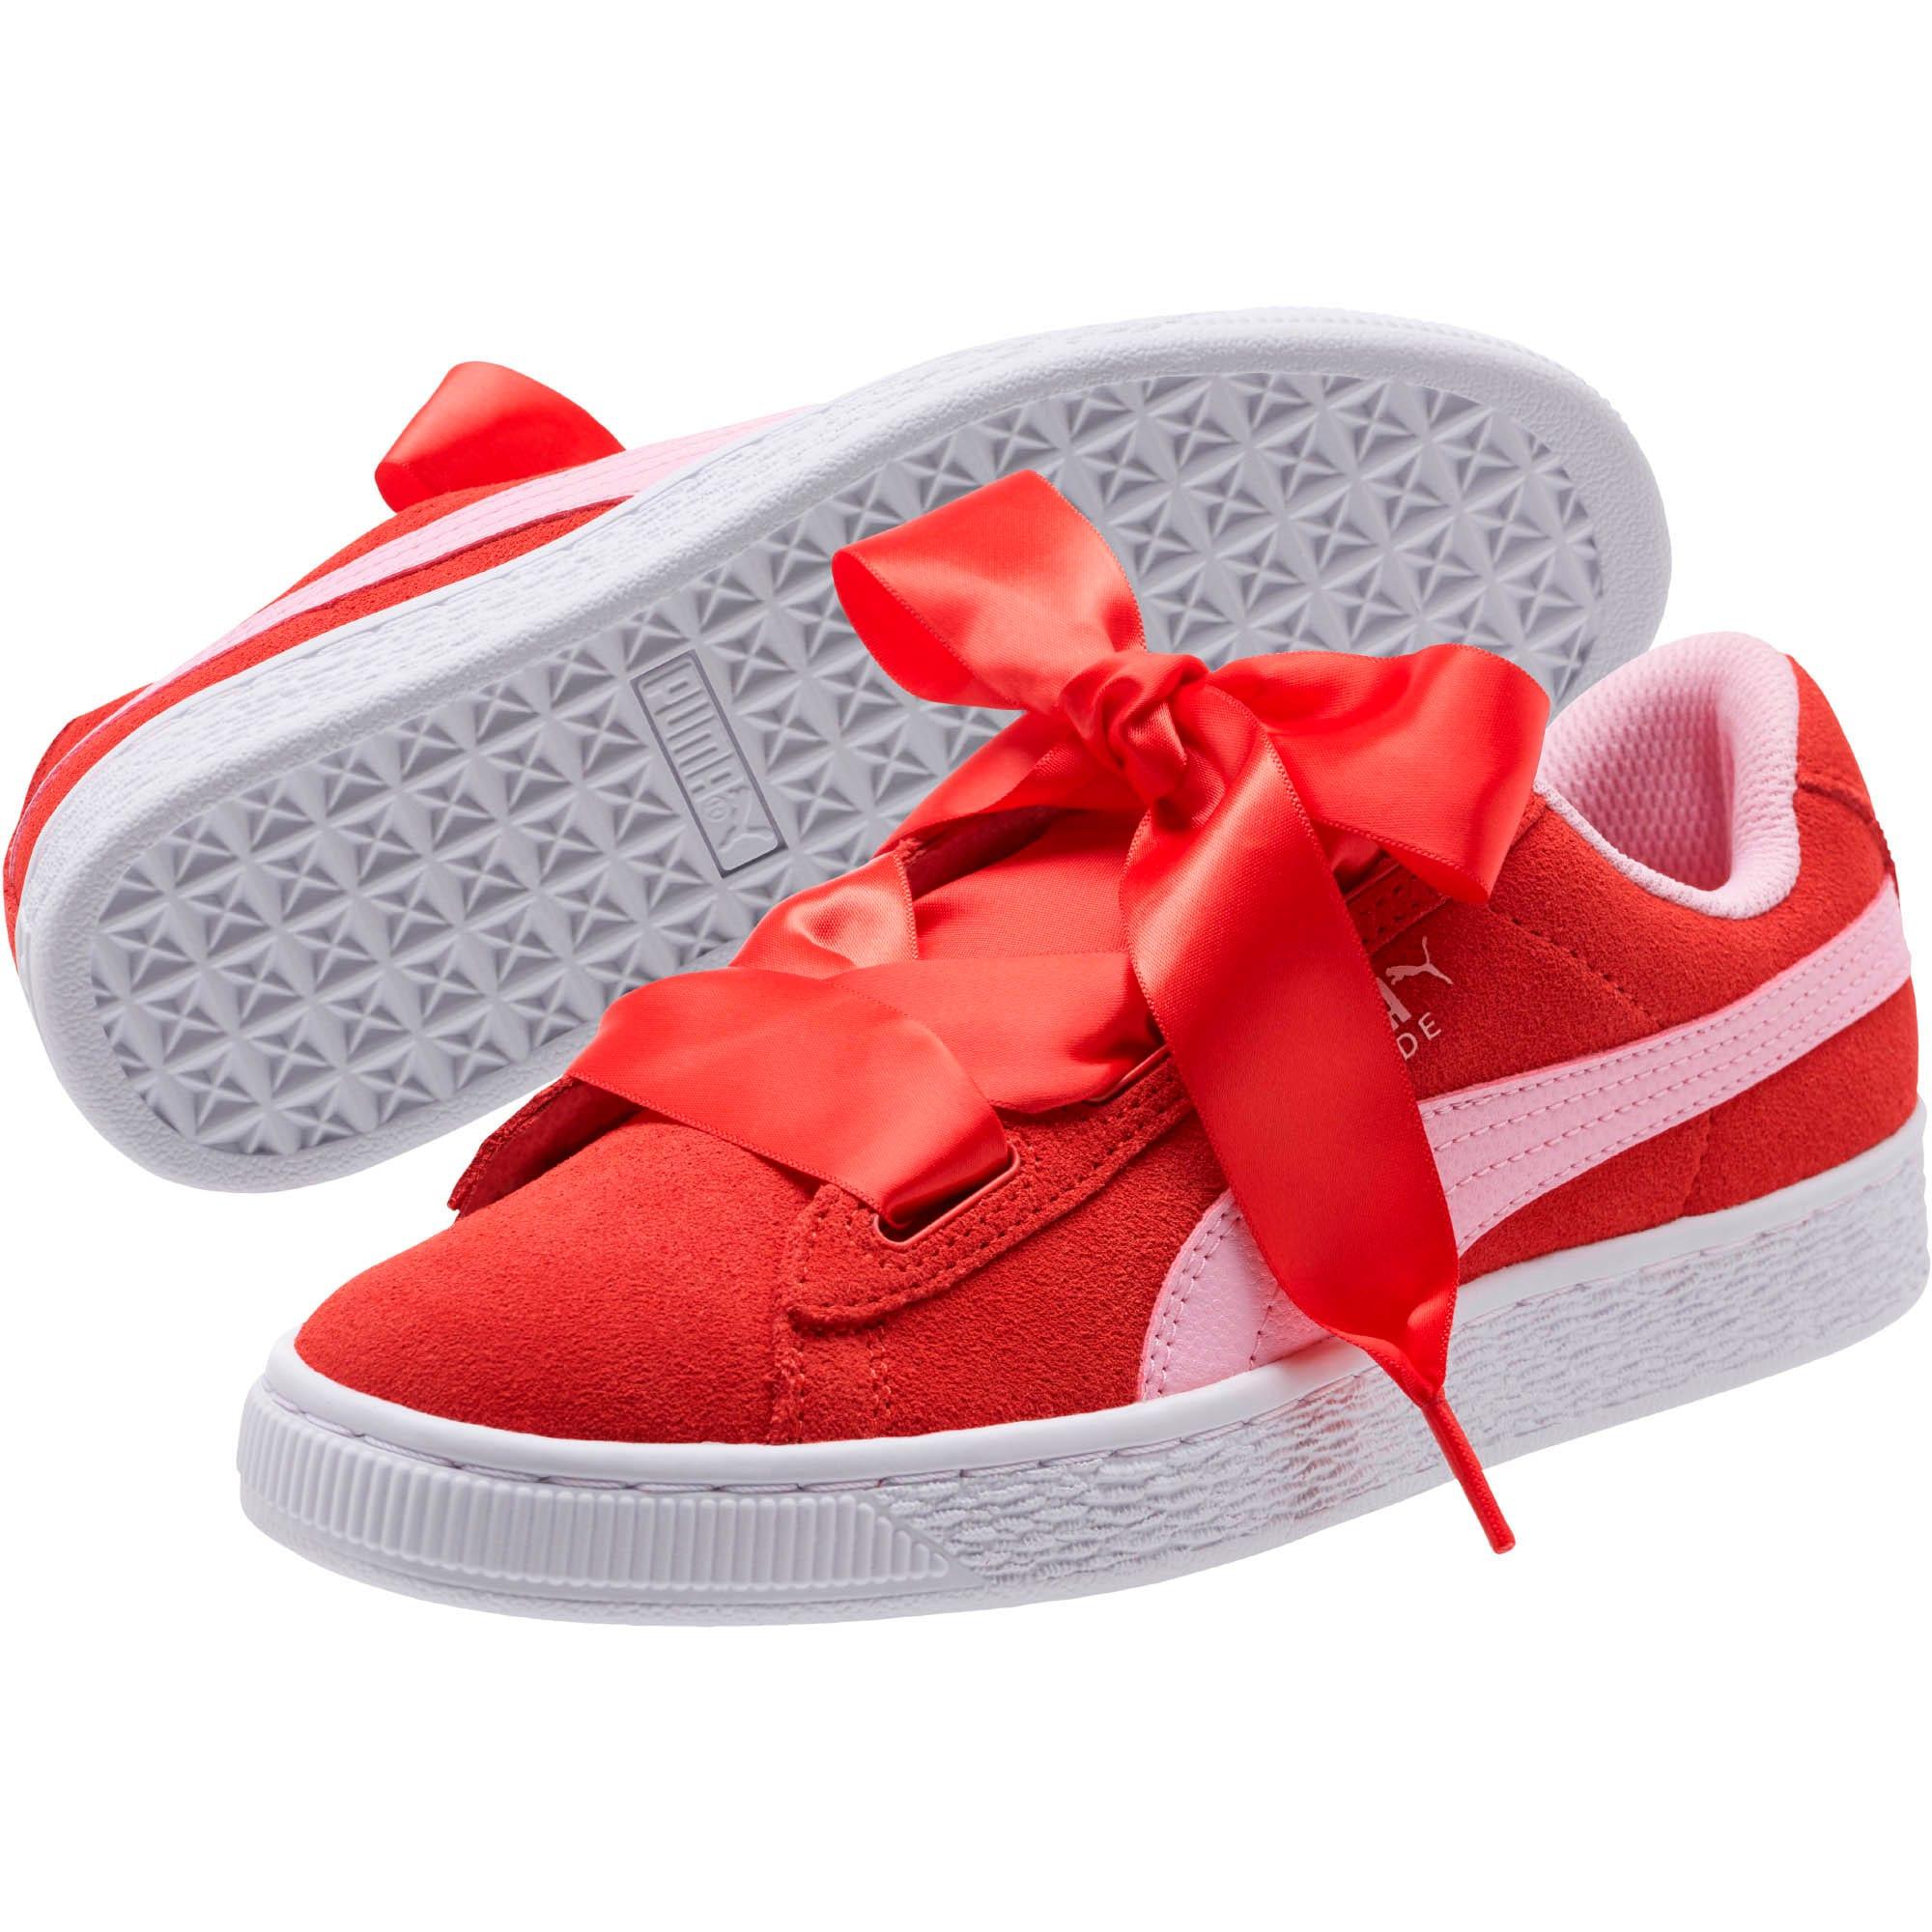 Thumbnail 2 of Suede Heart Radicals Sneakers JR, Hibiscus -Pale Pink, medium